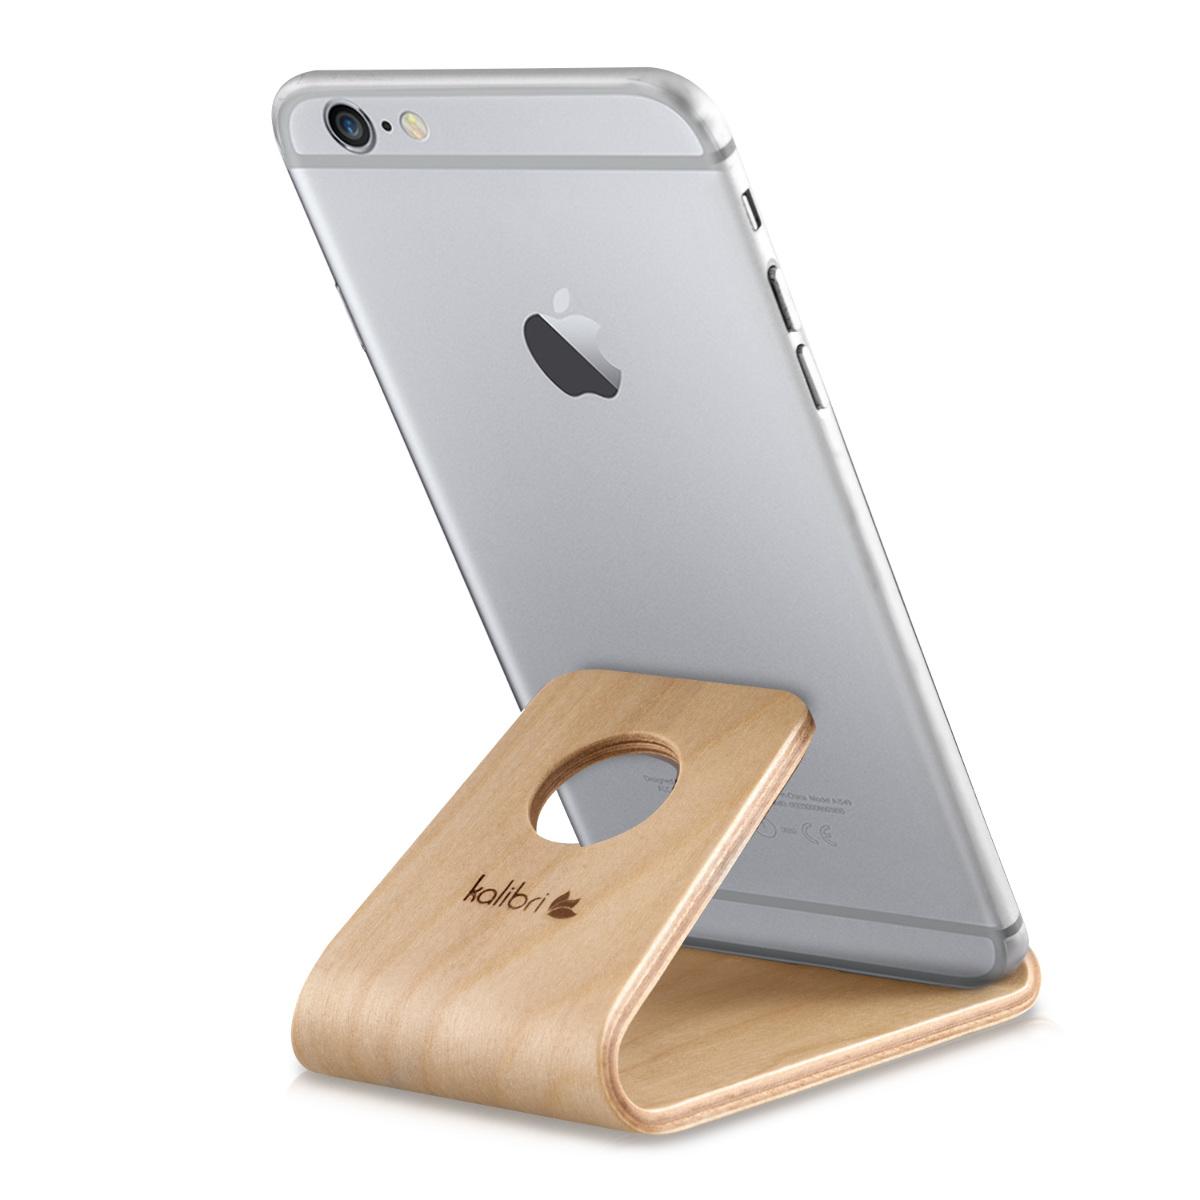 Kalibri Universal Wooden Stand - Ξύλινη Βάση για iPhone / Android / Tablet / e-Reader - Light Brown (38799.24)